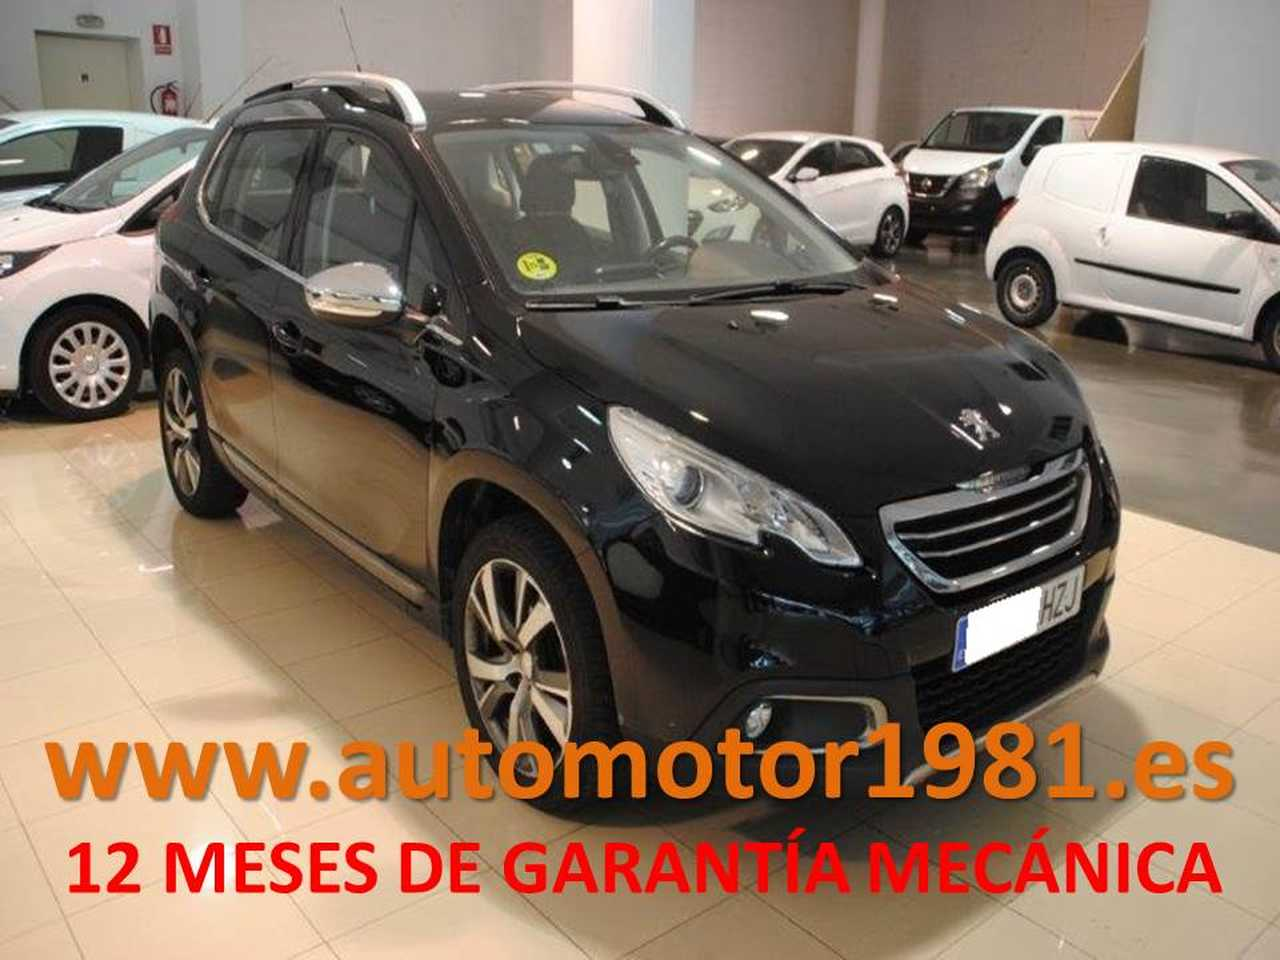 Peugeot 2008 1.6 e-HDI Allure 115 - 12 MESES GARANTIA MECANICA  - Foto 1